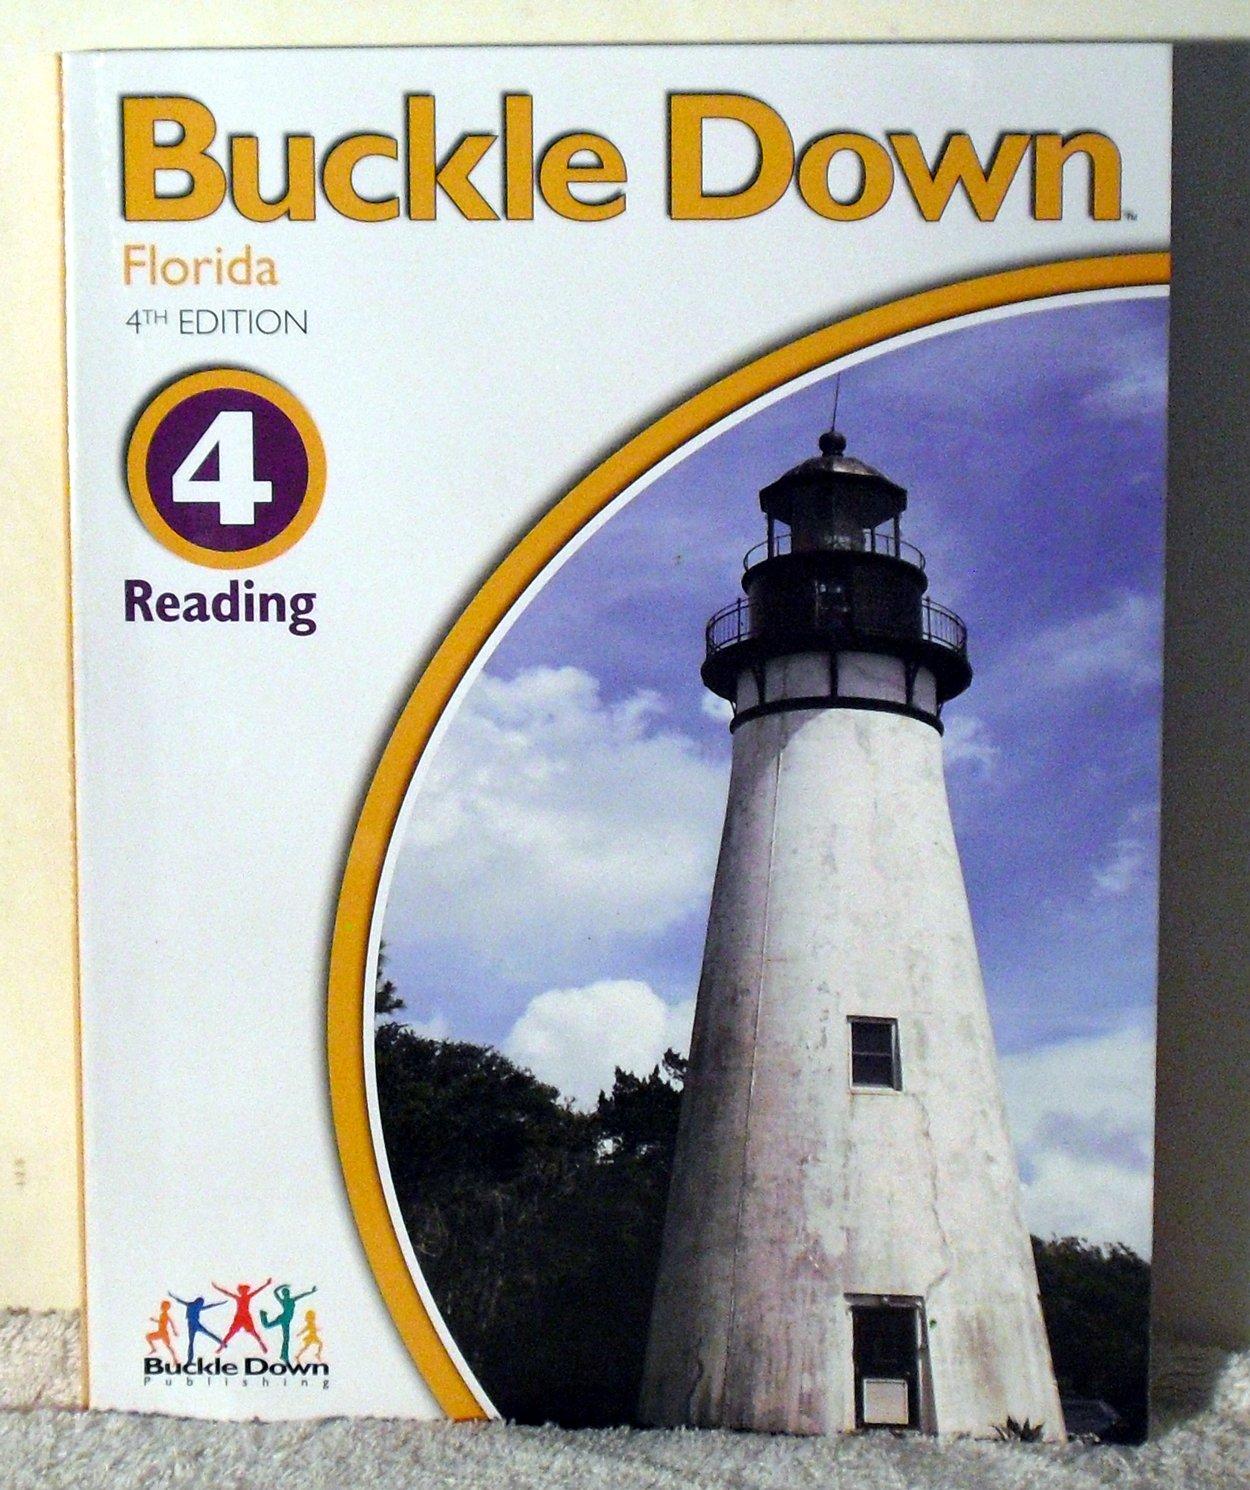 Workbooks buckle down workbooks : Buckle Down Florida 4th Edition Reading: Daniel Smith ...